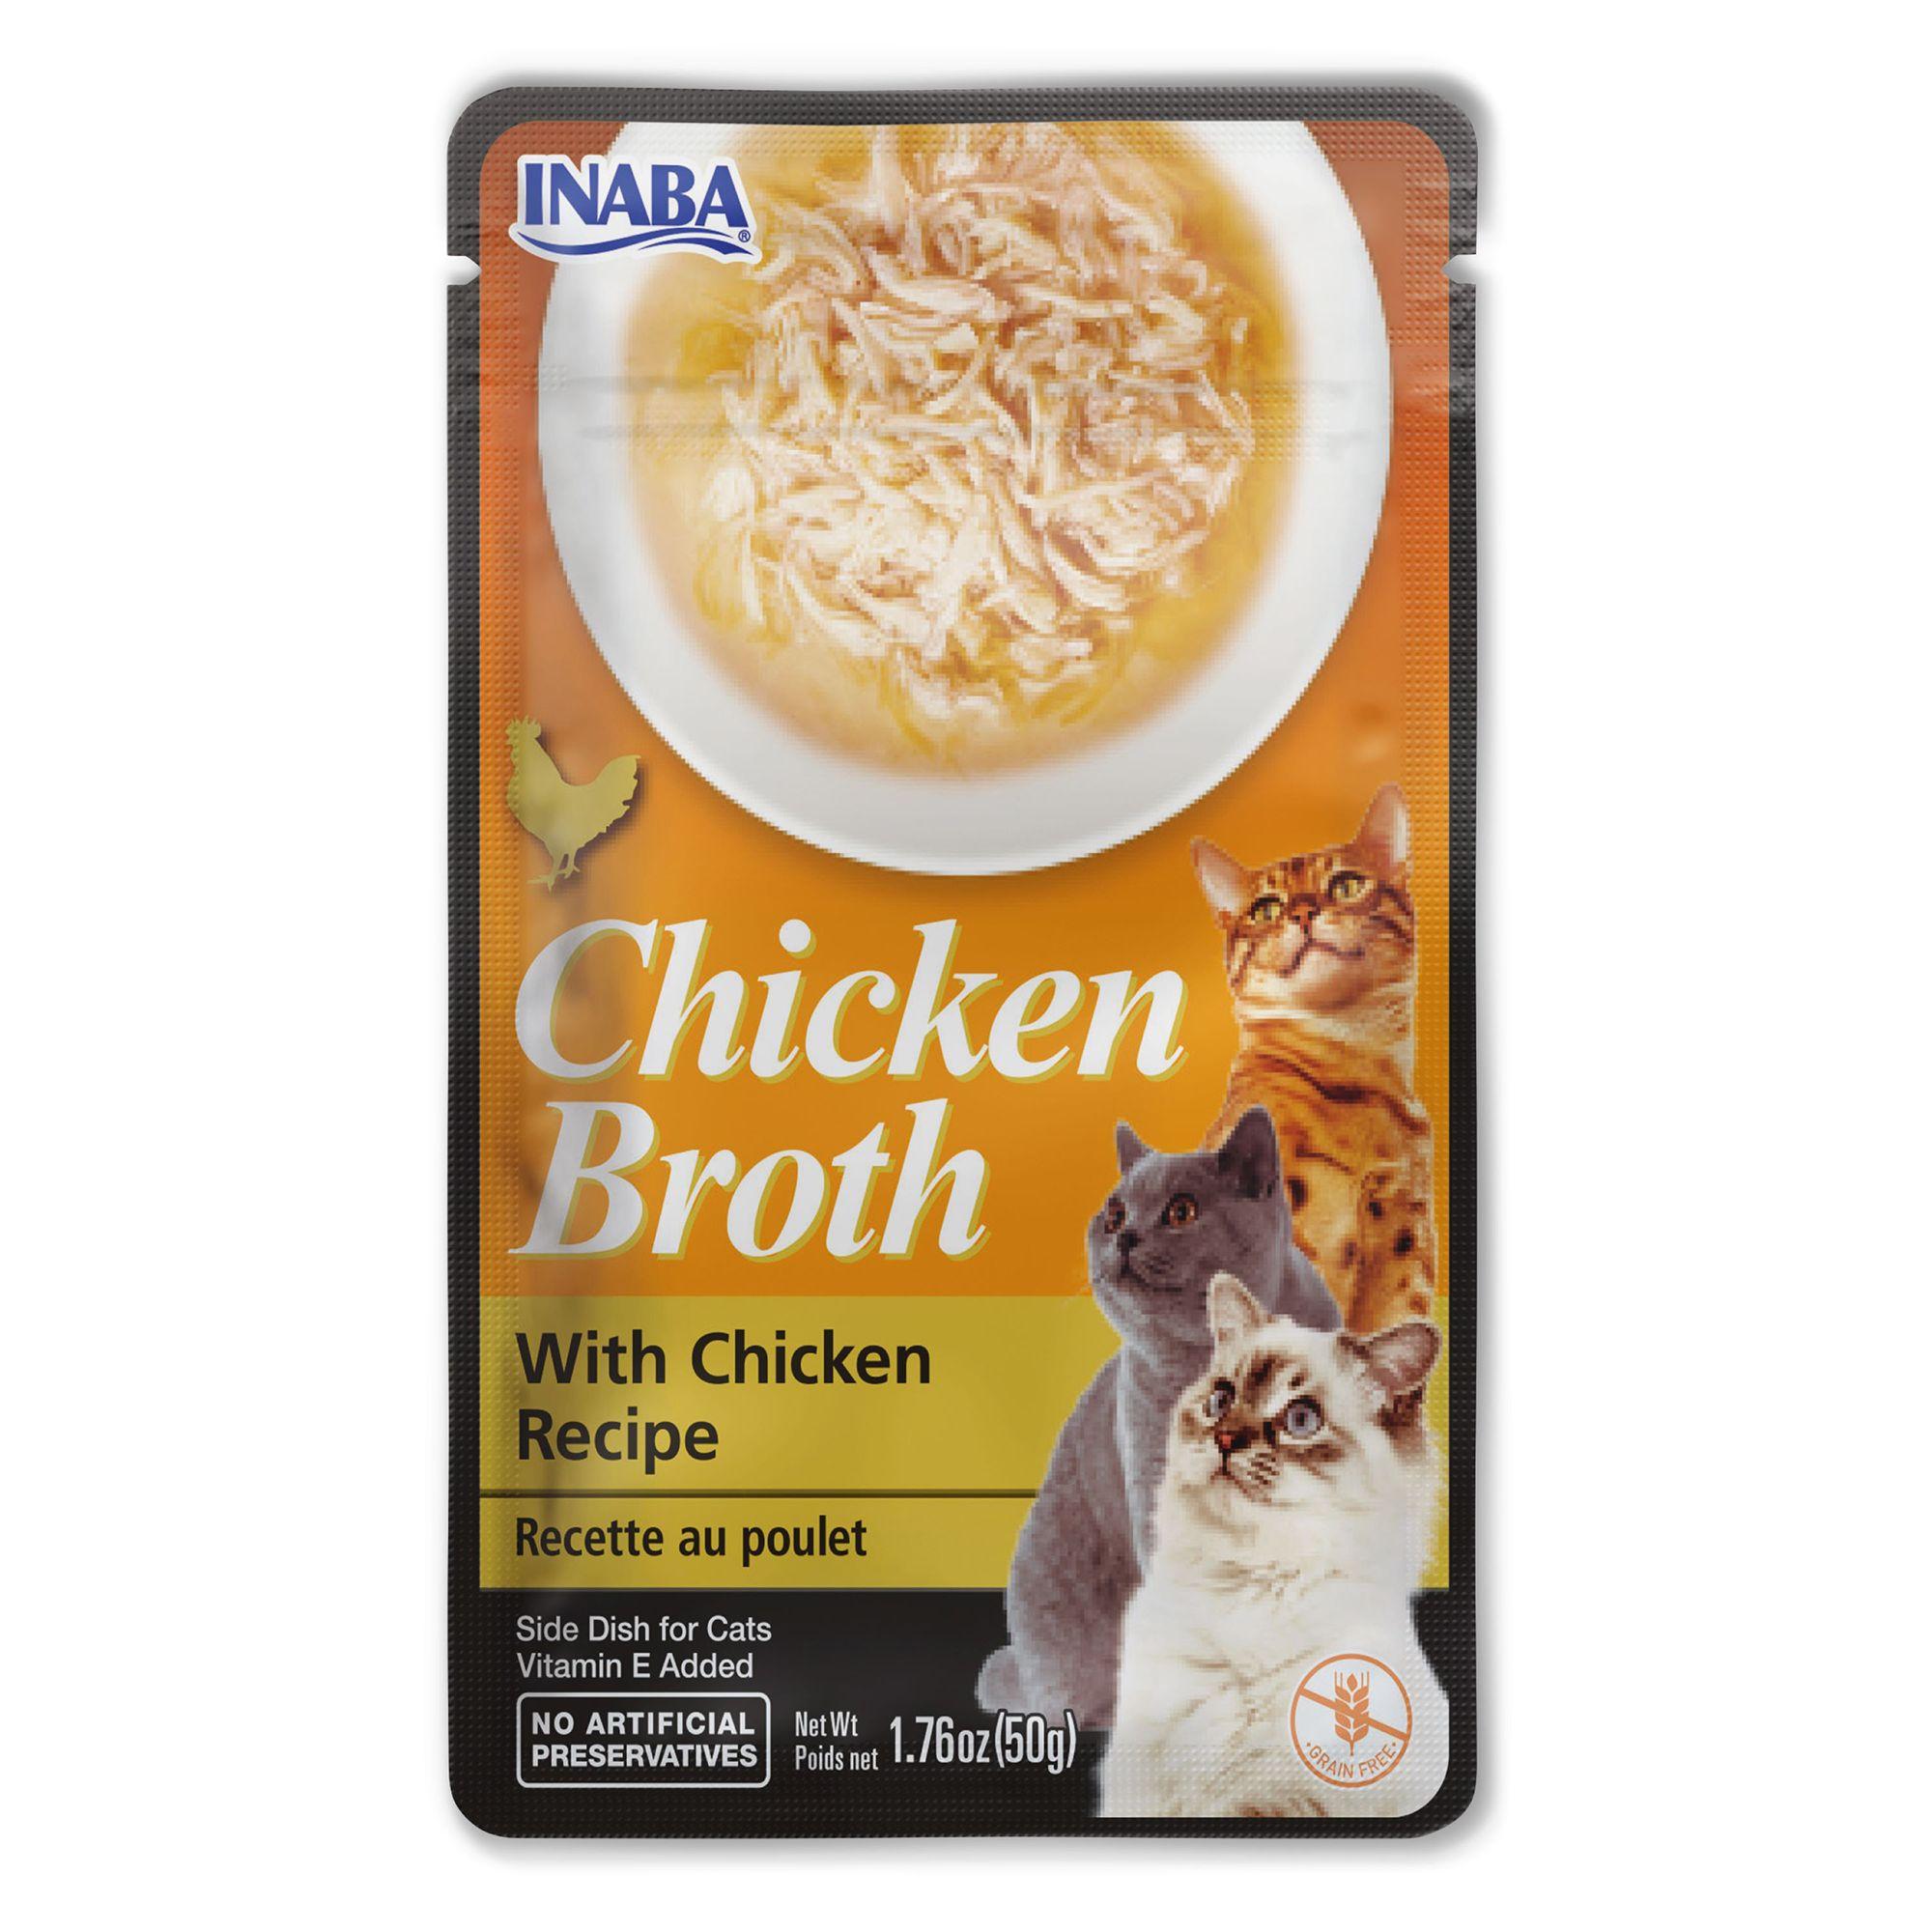 Inaba Chicken Broth Side Dish Cat Treat - Chicken Recipe